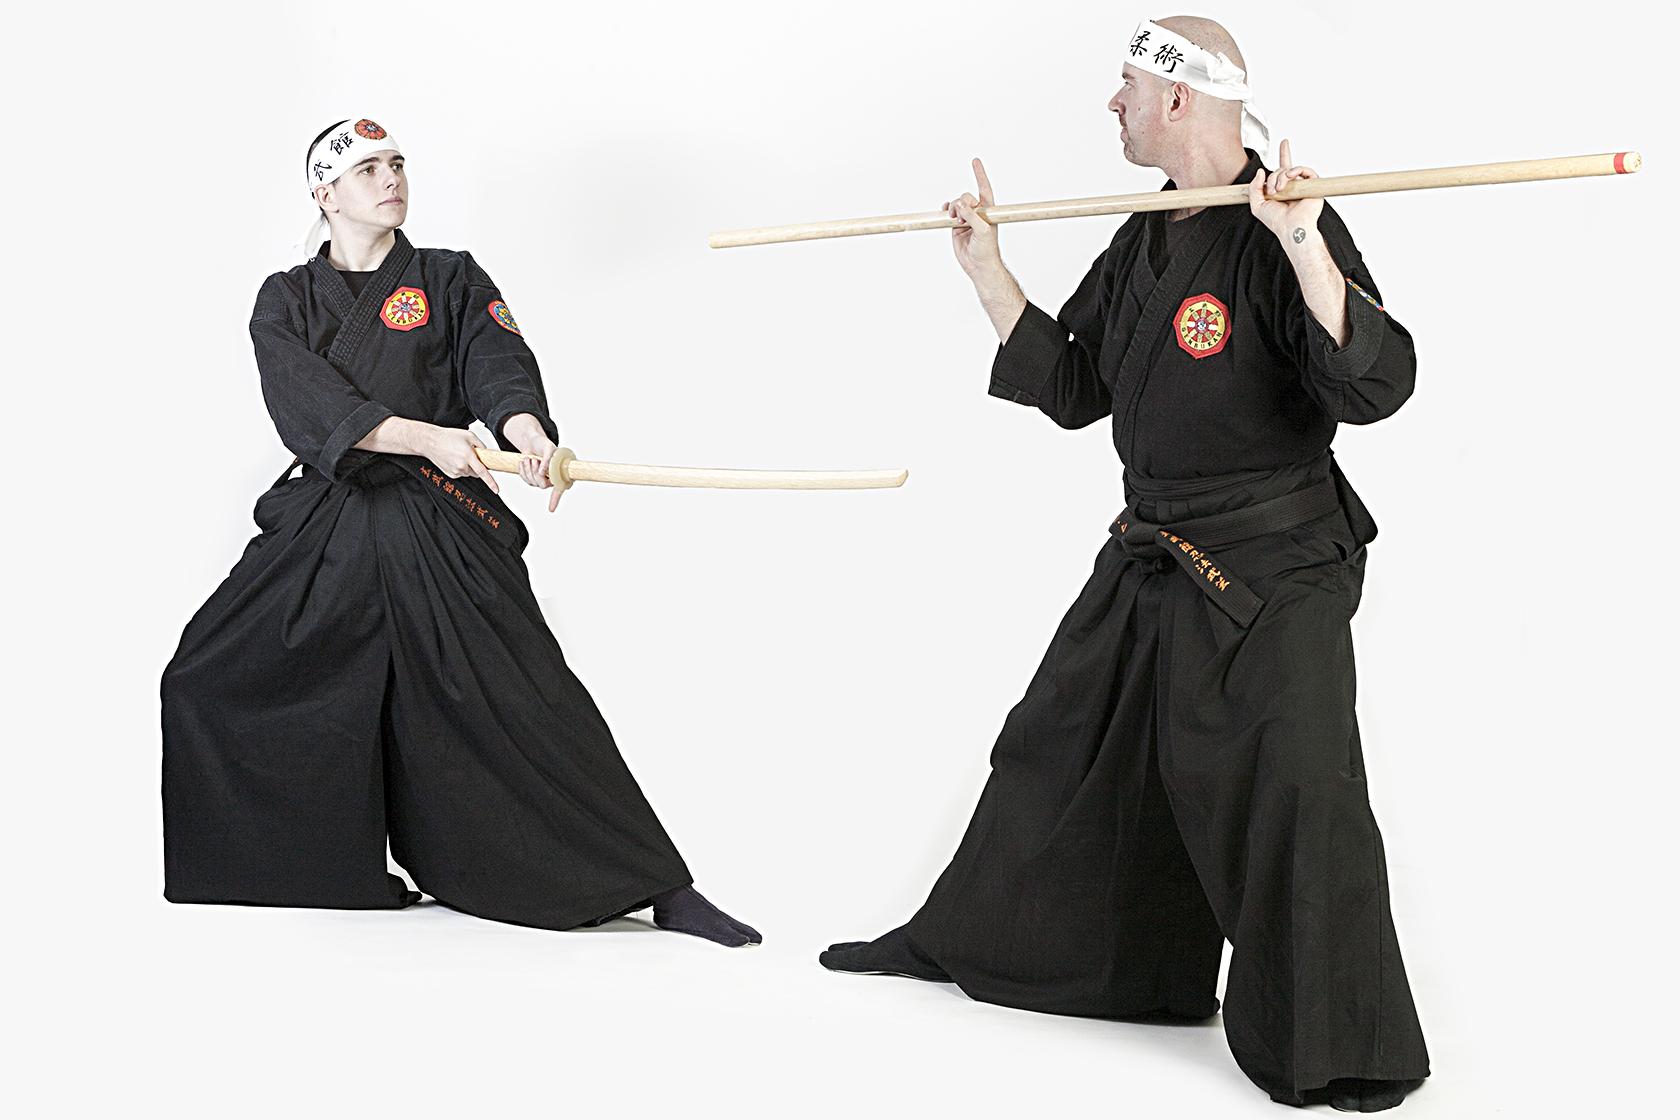 Genbukan - Armas tradicionales